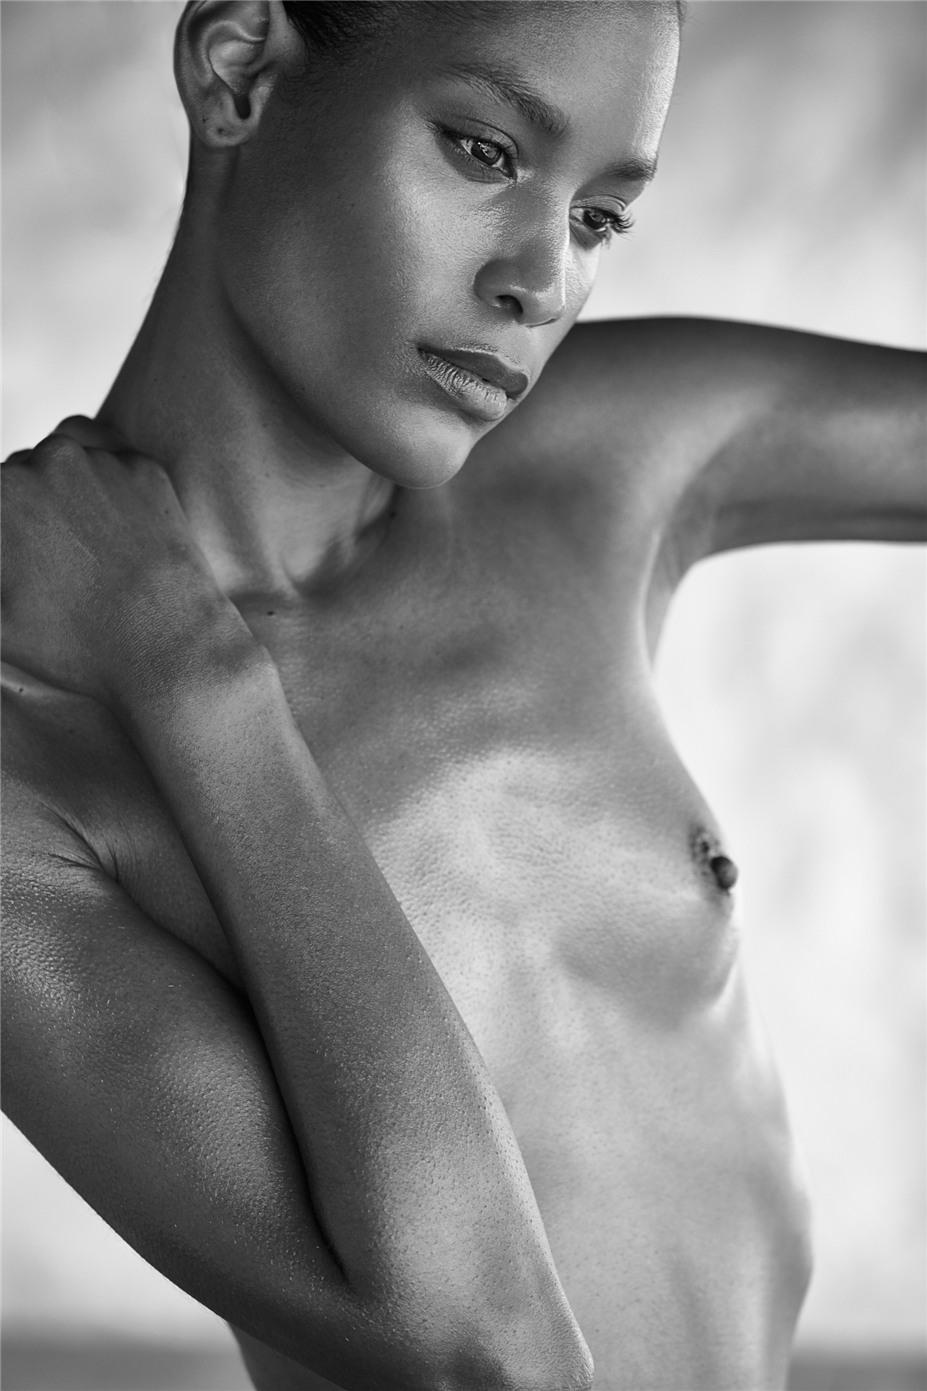 Обнаженные девушки на пляжах Ибицы / Ibiza Nudes by Diane Betties - Fabiana Ricardo